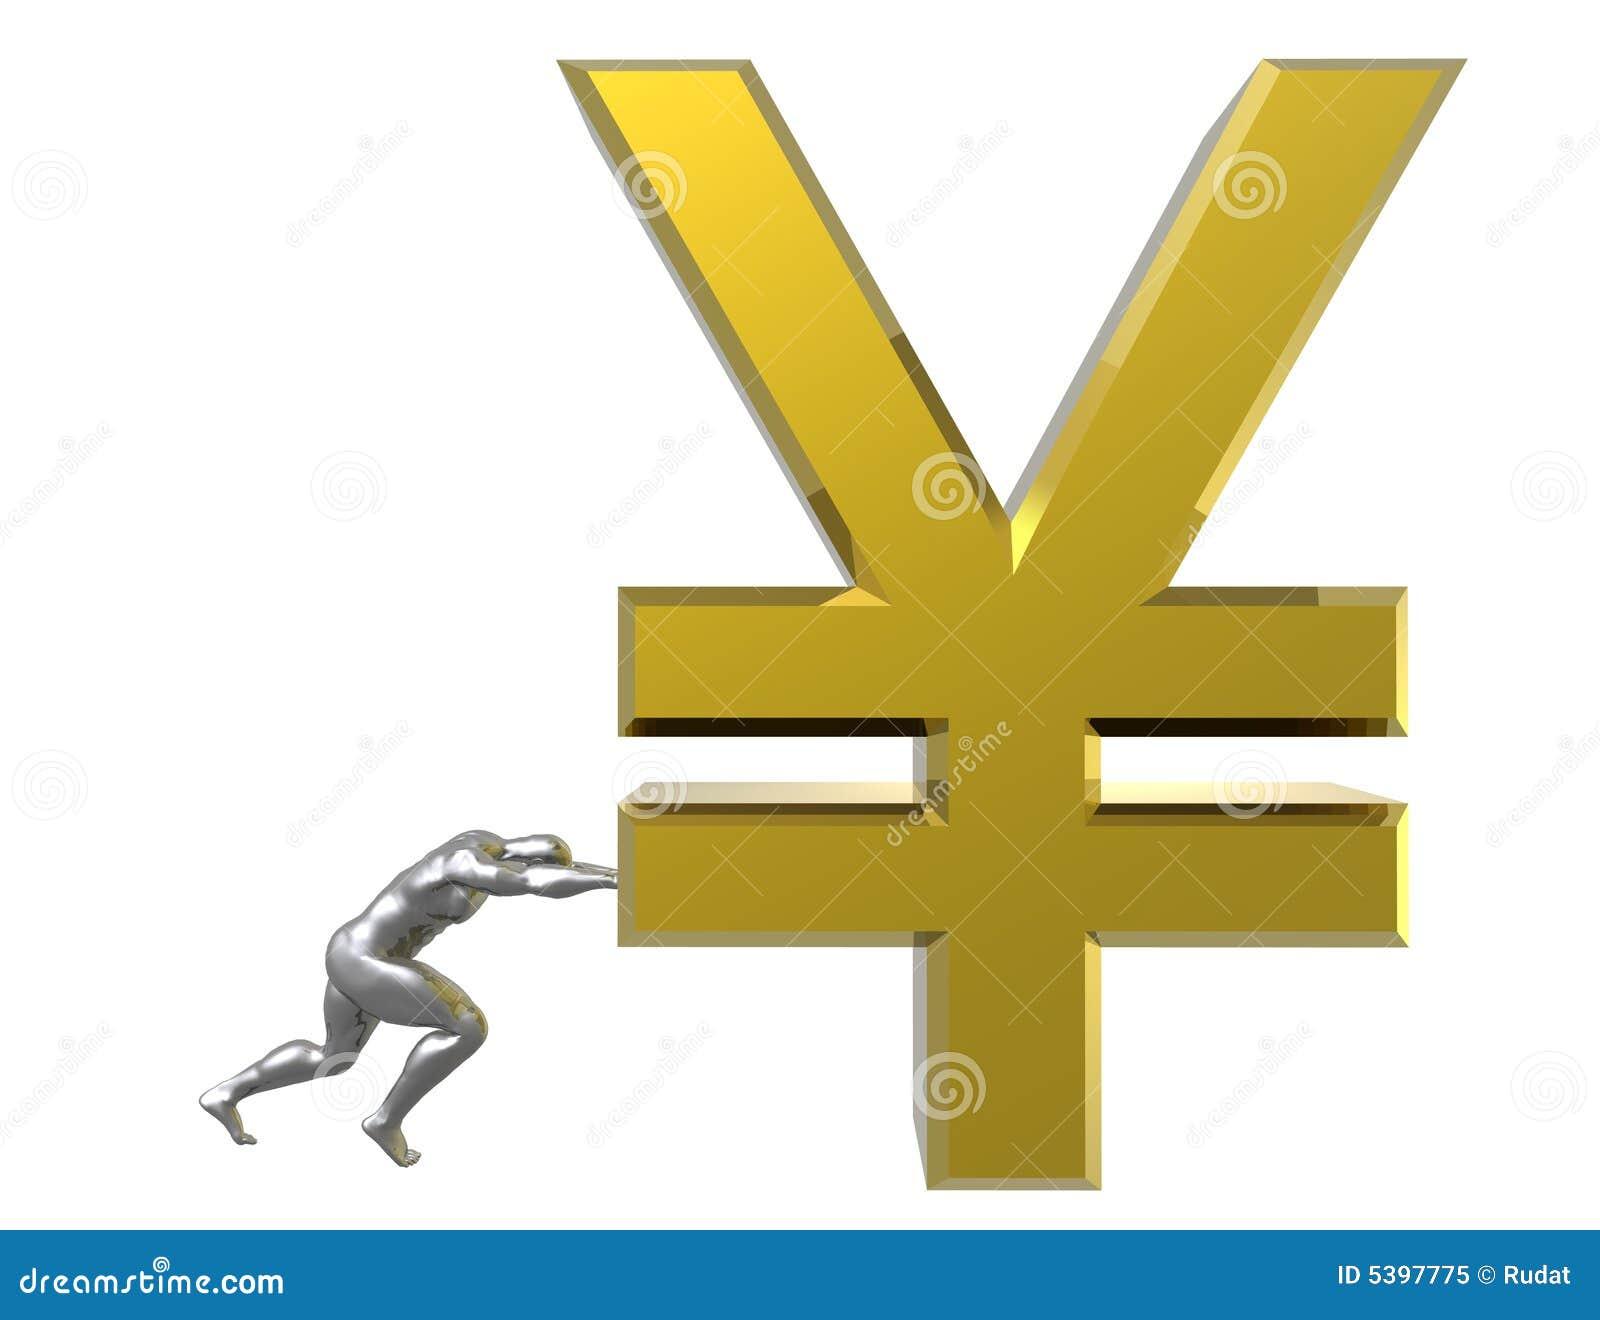 Japanese yen sign stock illustration illustration of business japanese yen sign biocorpaavc Choice Image